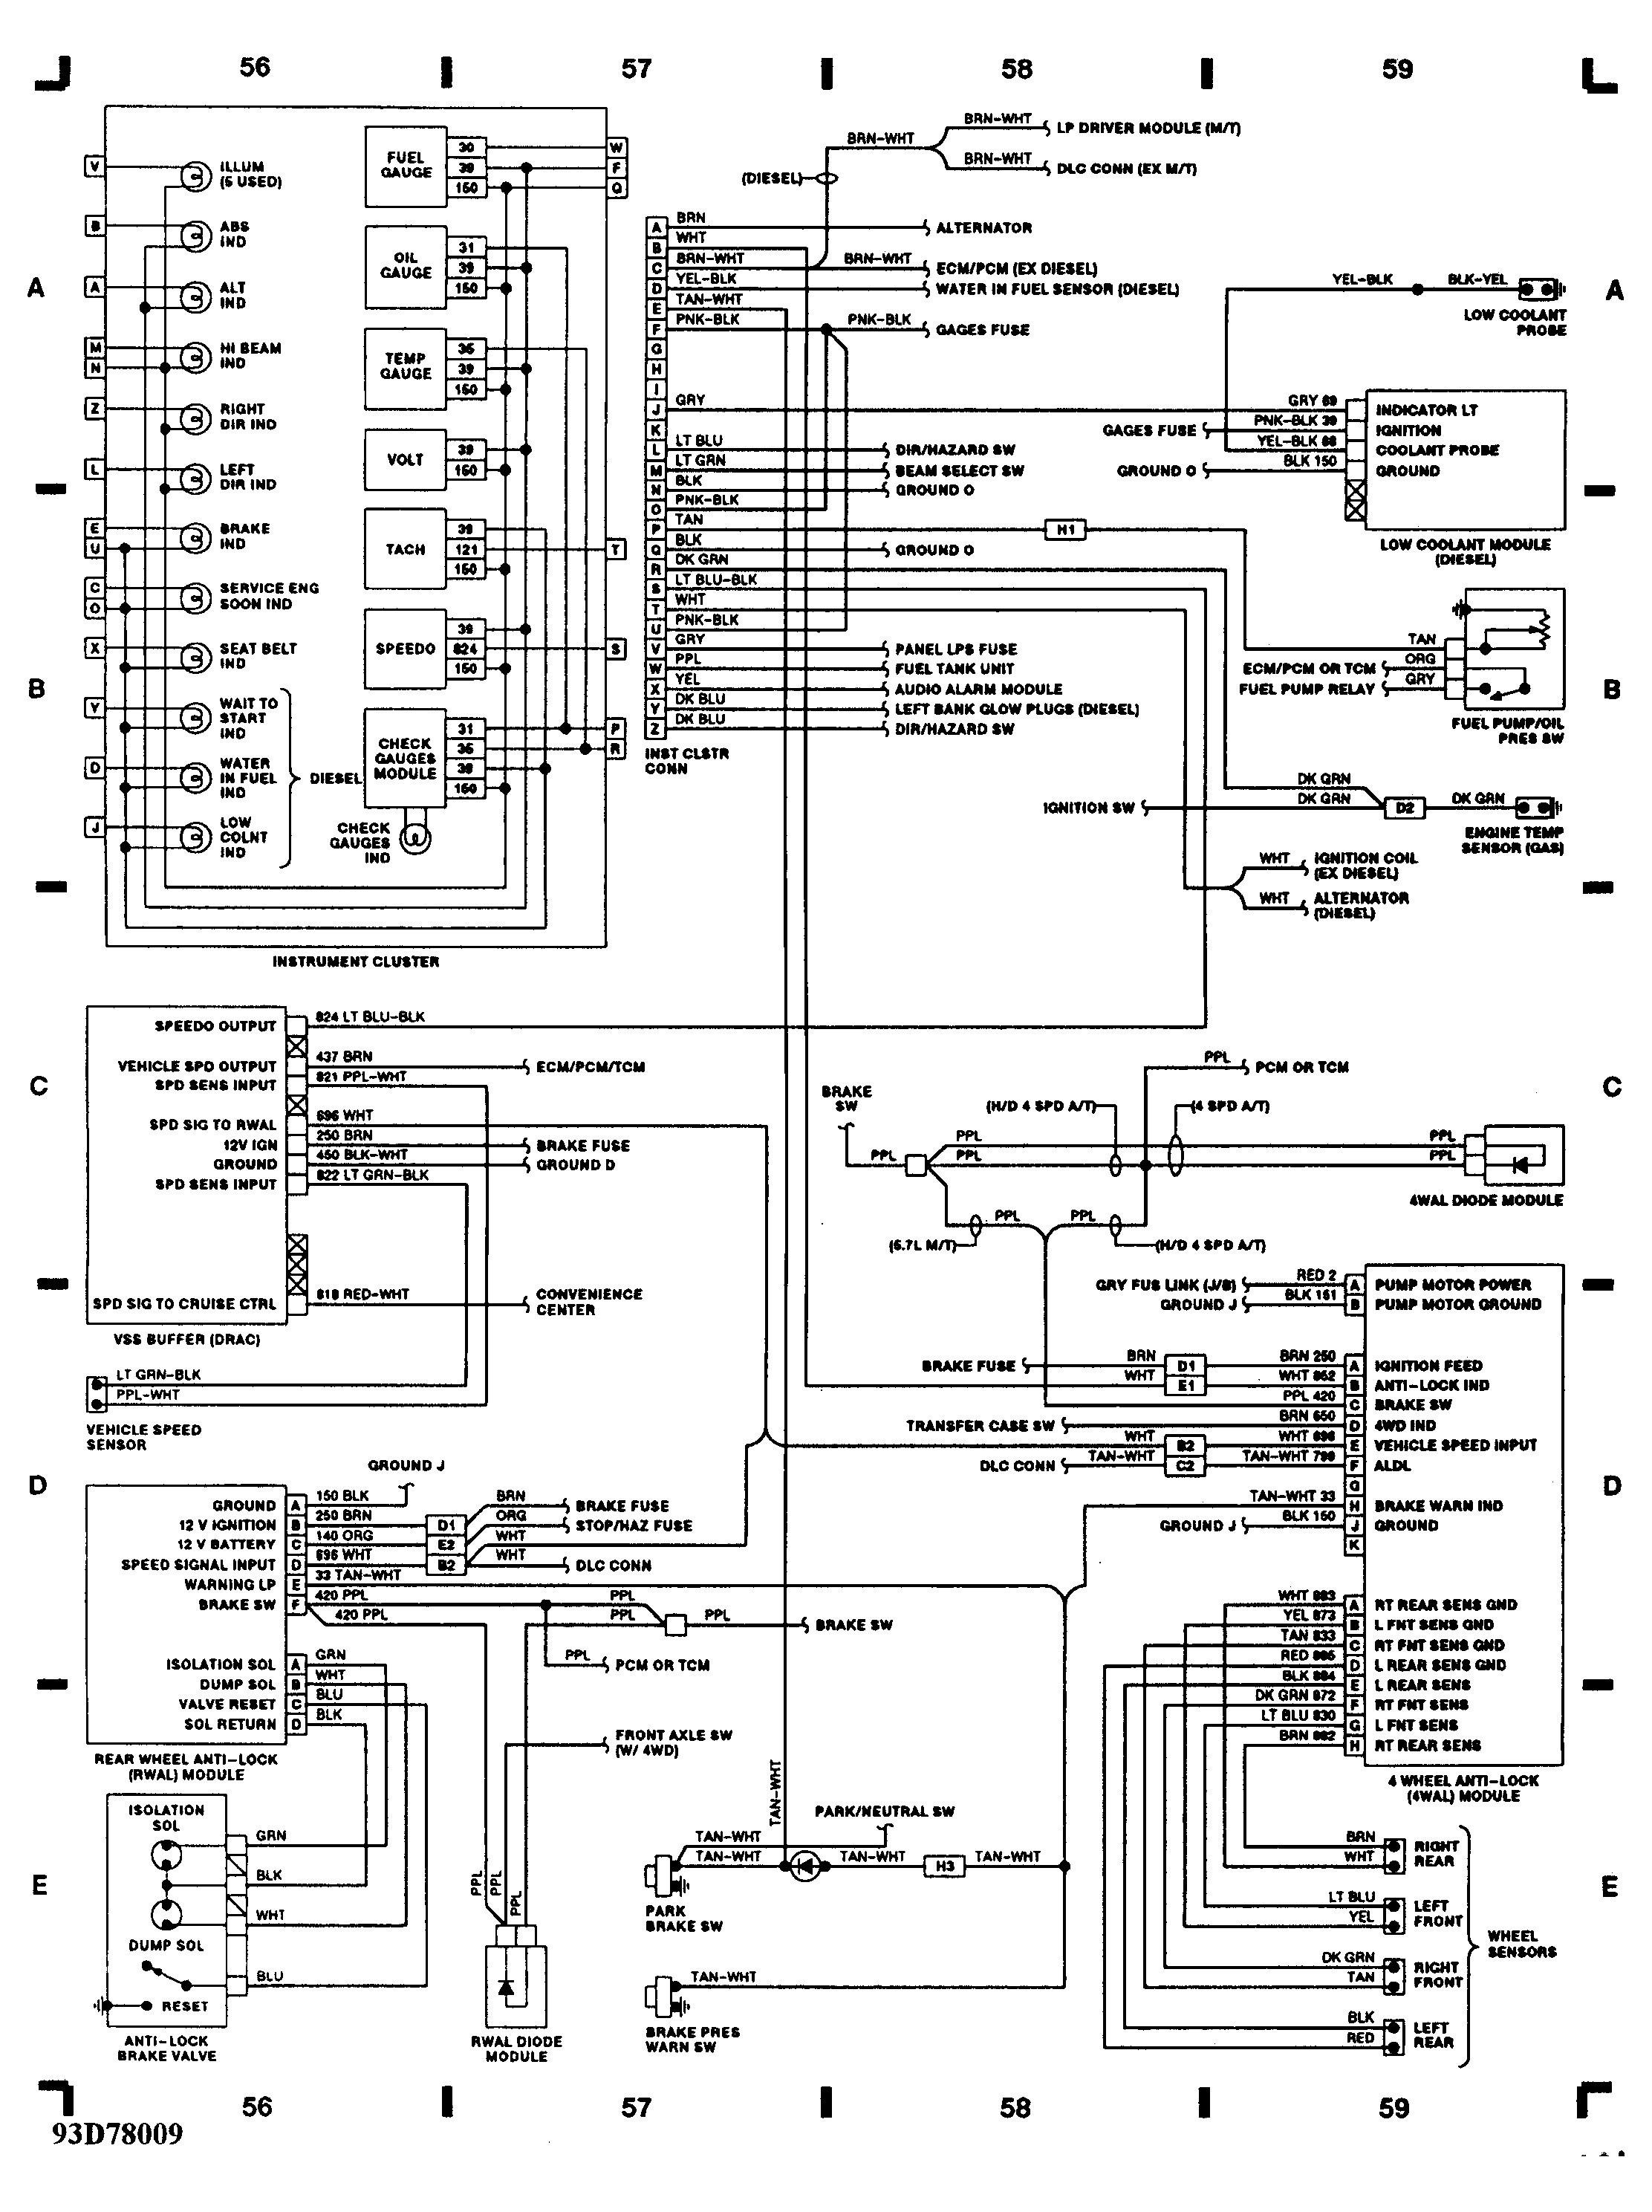 Chevy Silverado Wiring Diagram 1998 Chevy Tahoe Wiring Diagram Fresh Wiring Diagrams for 1995 Chevy